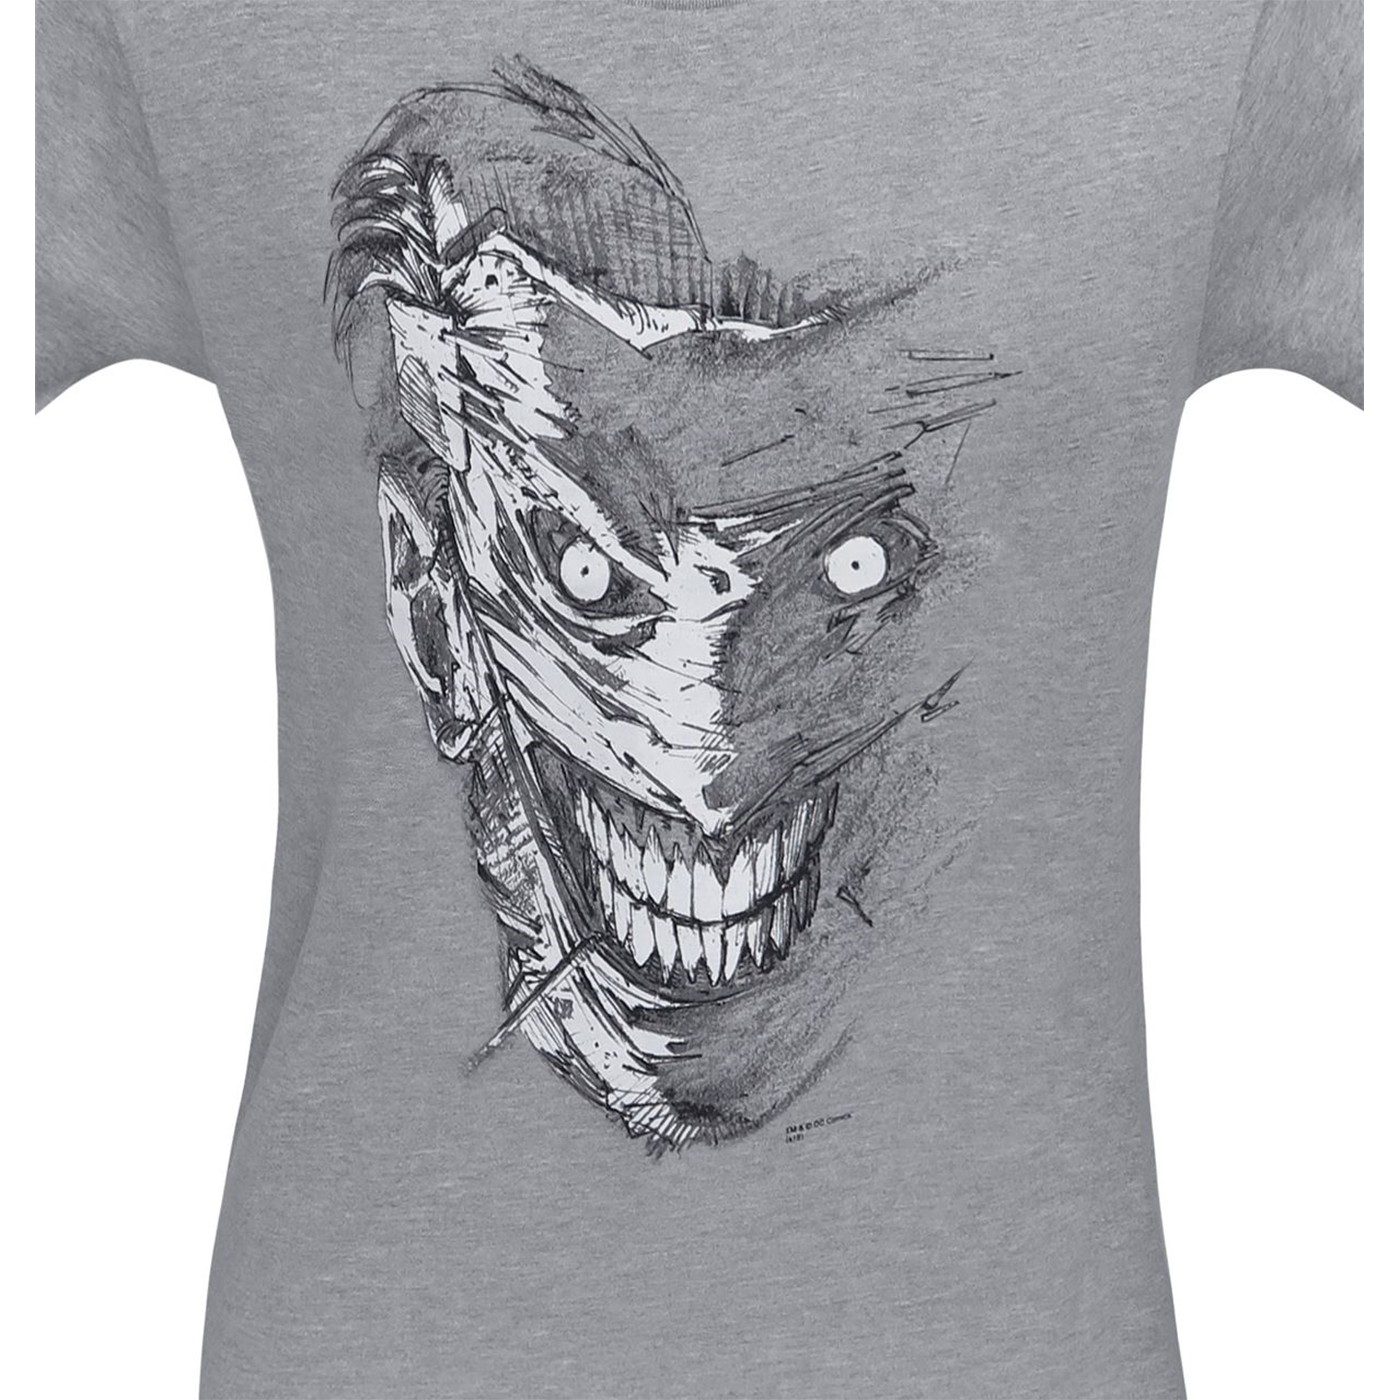 The Joker Crazy Again Men's T-Shirt